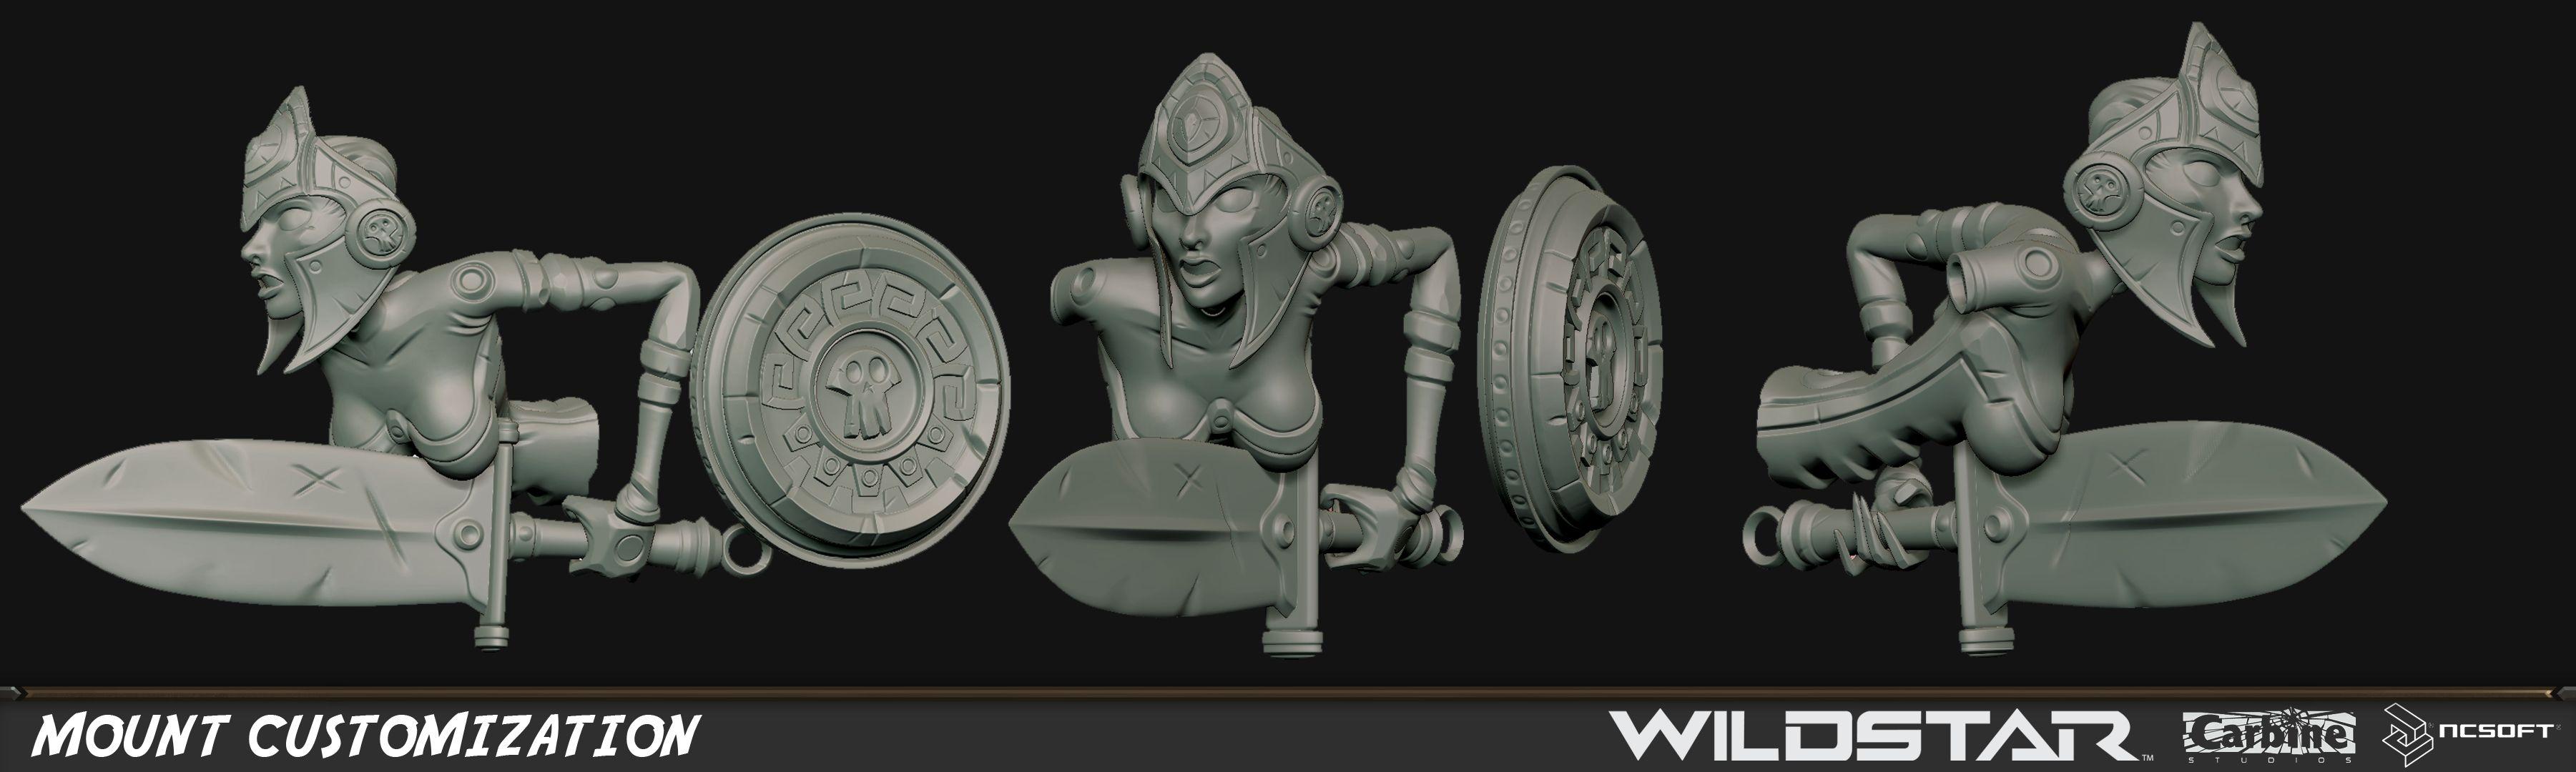 Brian McClain - 3D Artist: Wildstar